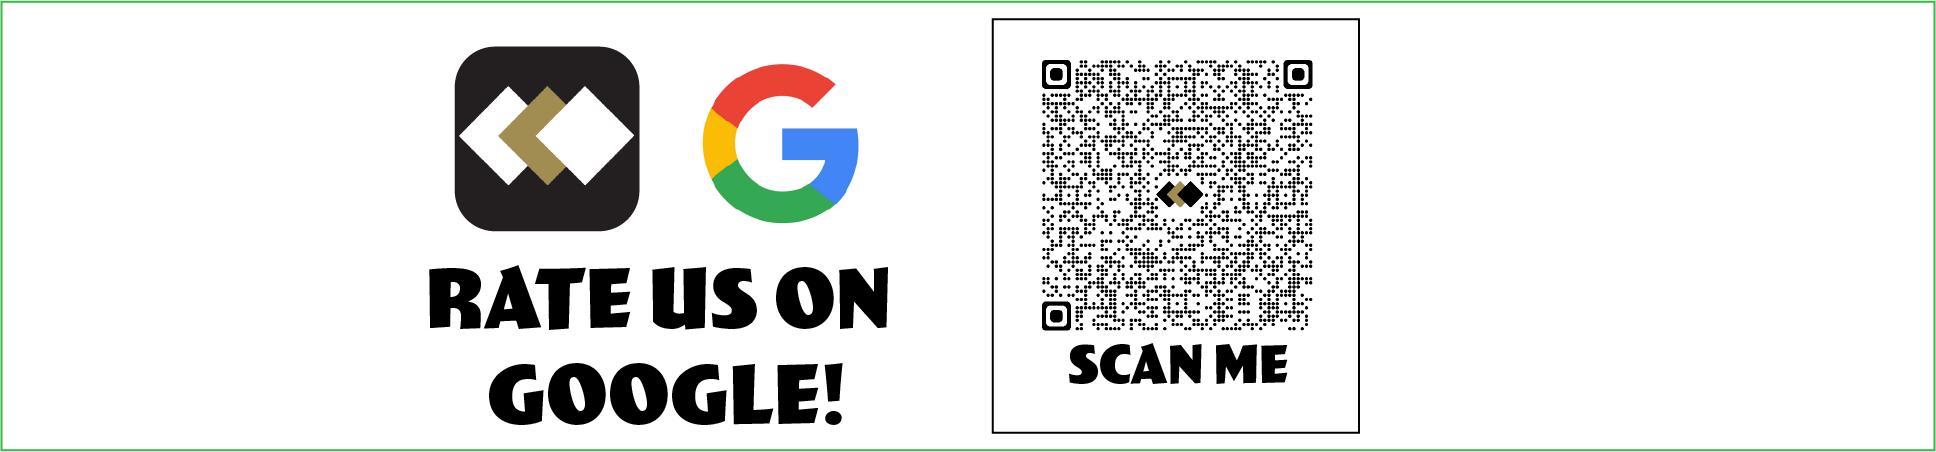 Rate us on google. SBR logo. Google logo. QR code